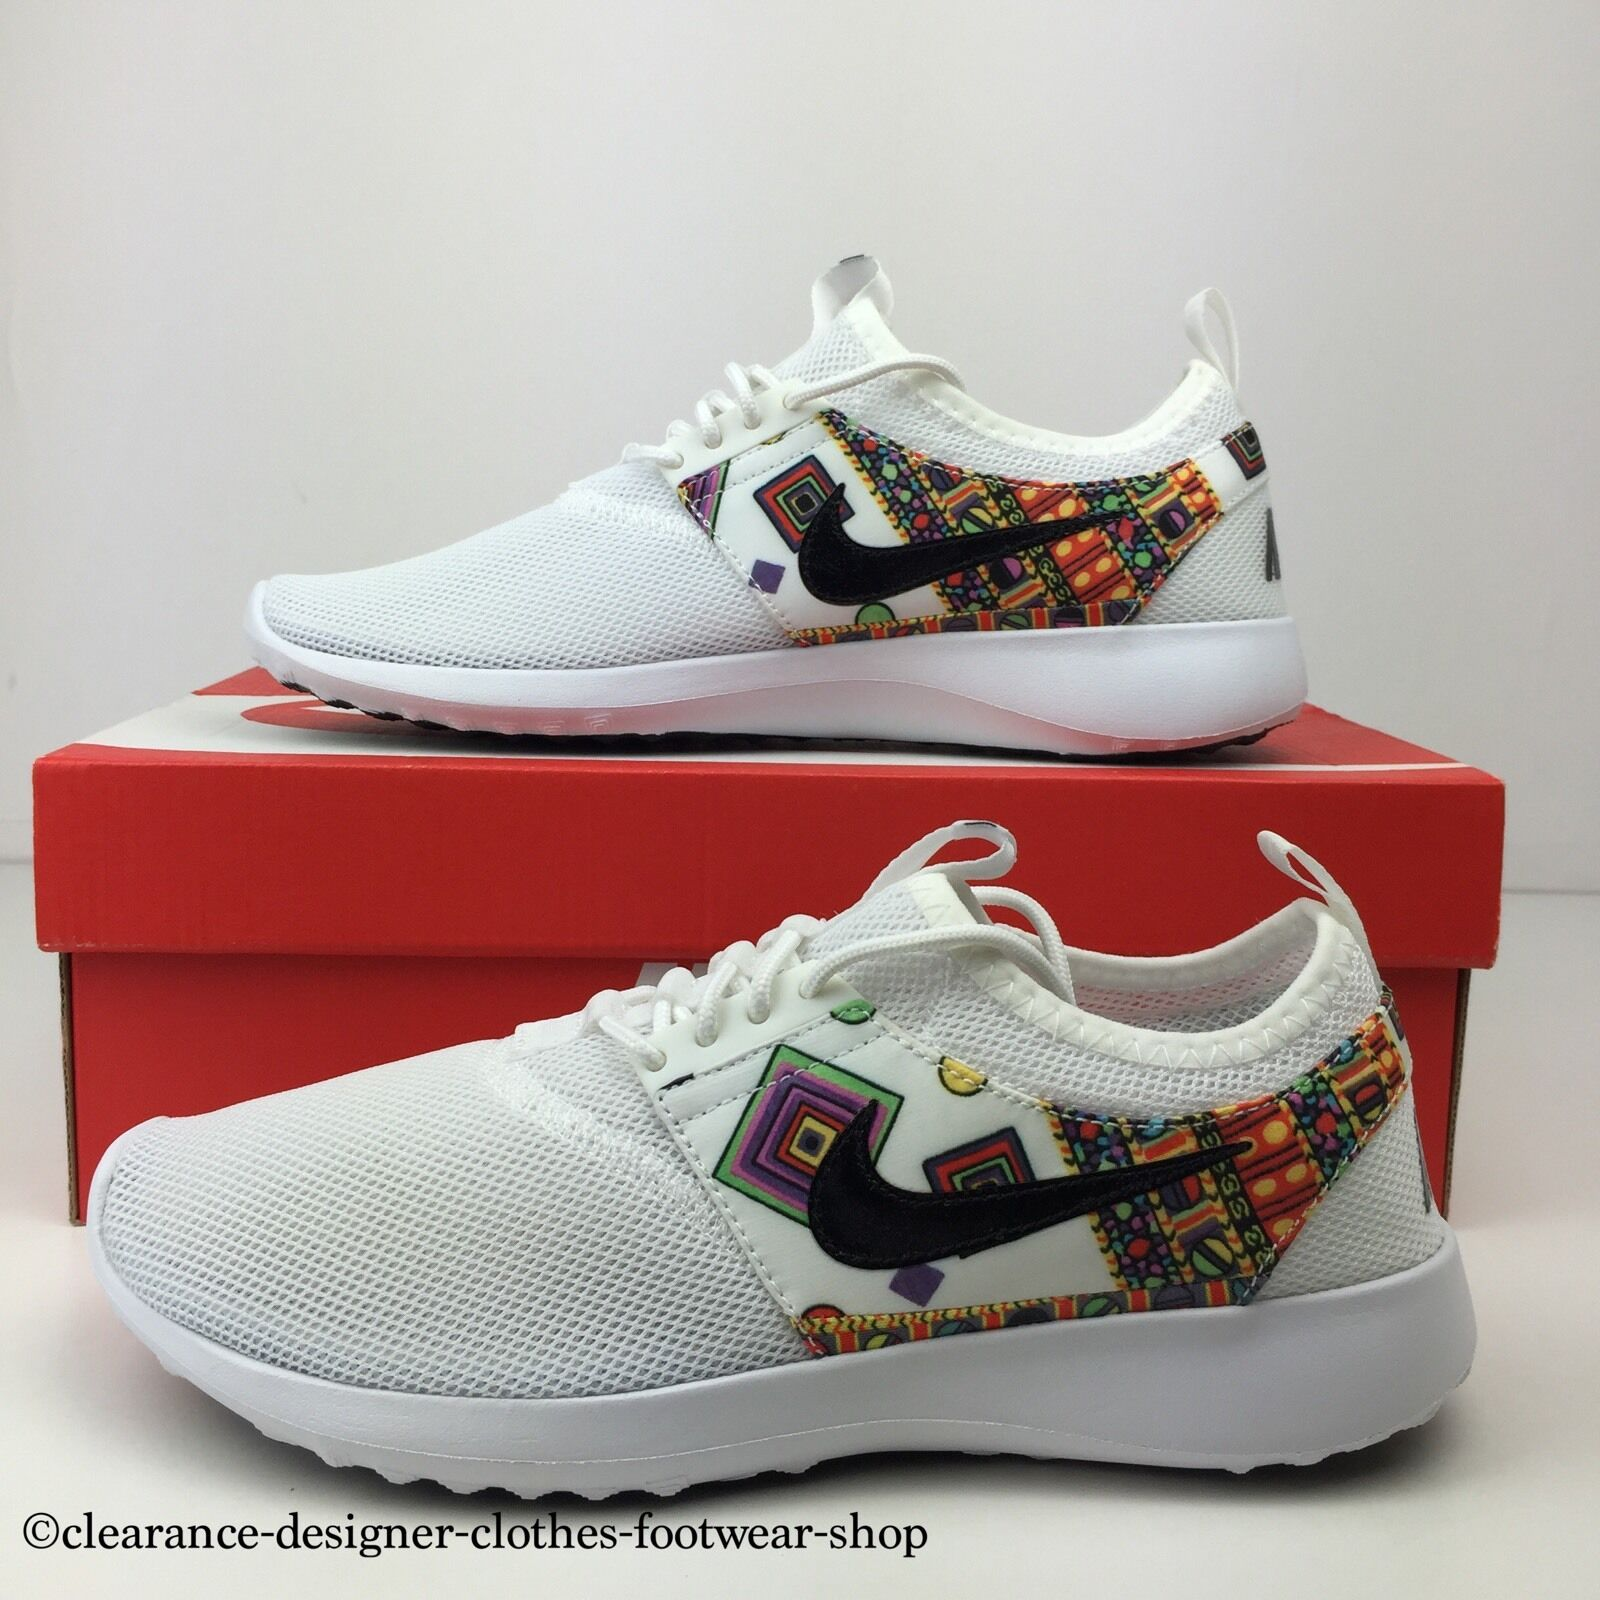 NIKE ZENJI LIB QS JUVENATE TRAINERS mujer NEW CASUAL zapatos UK 5.5